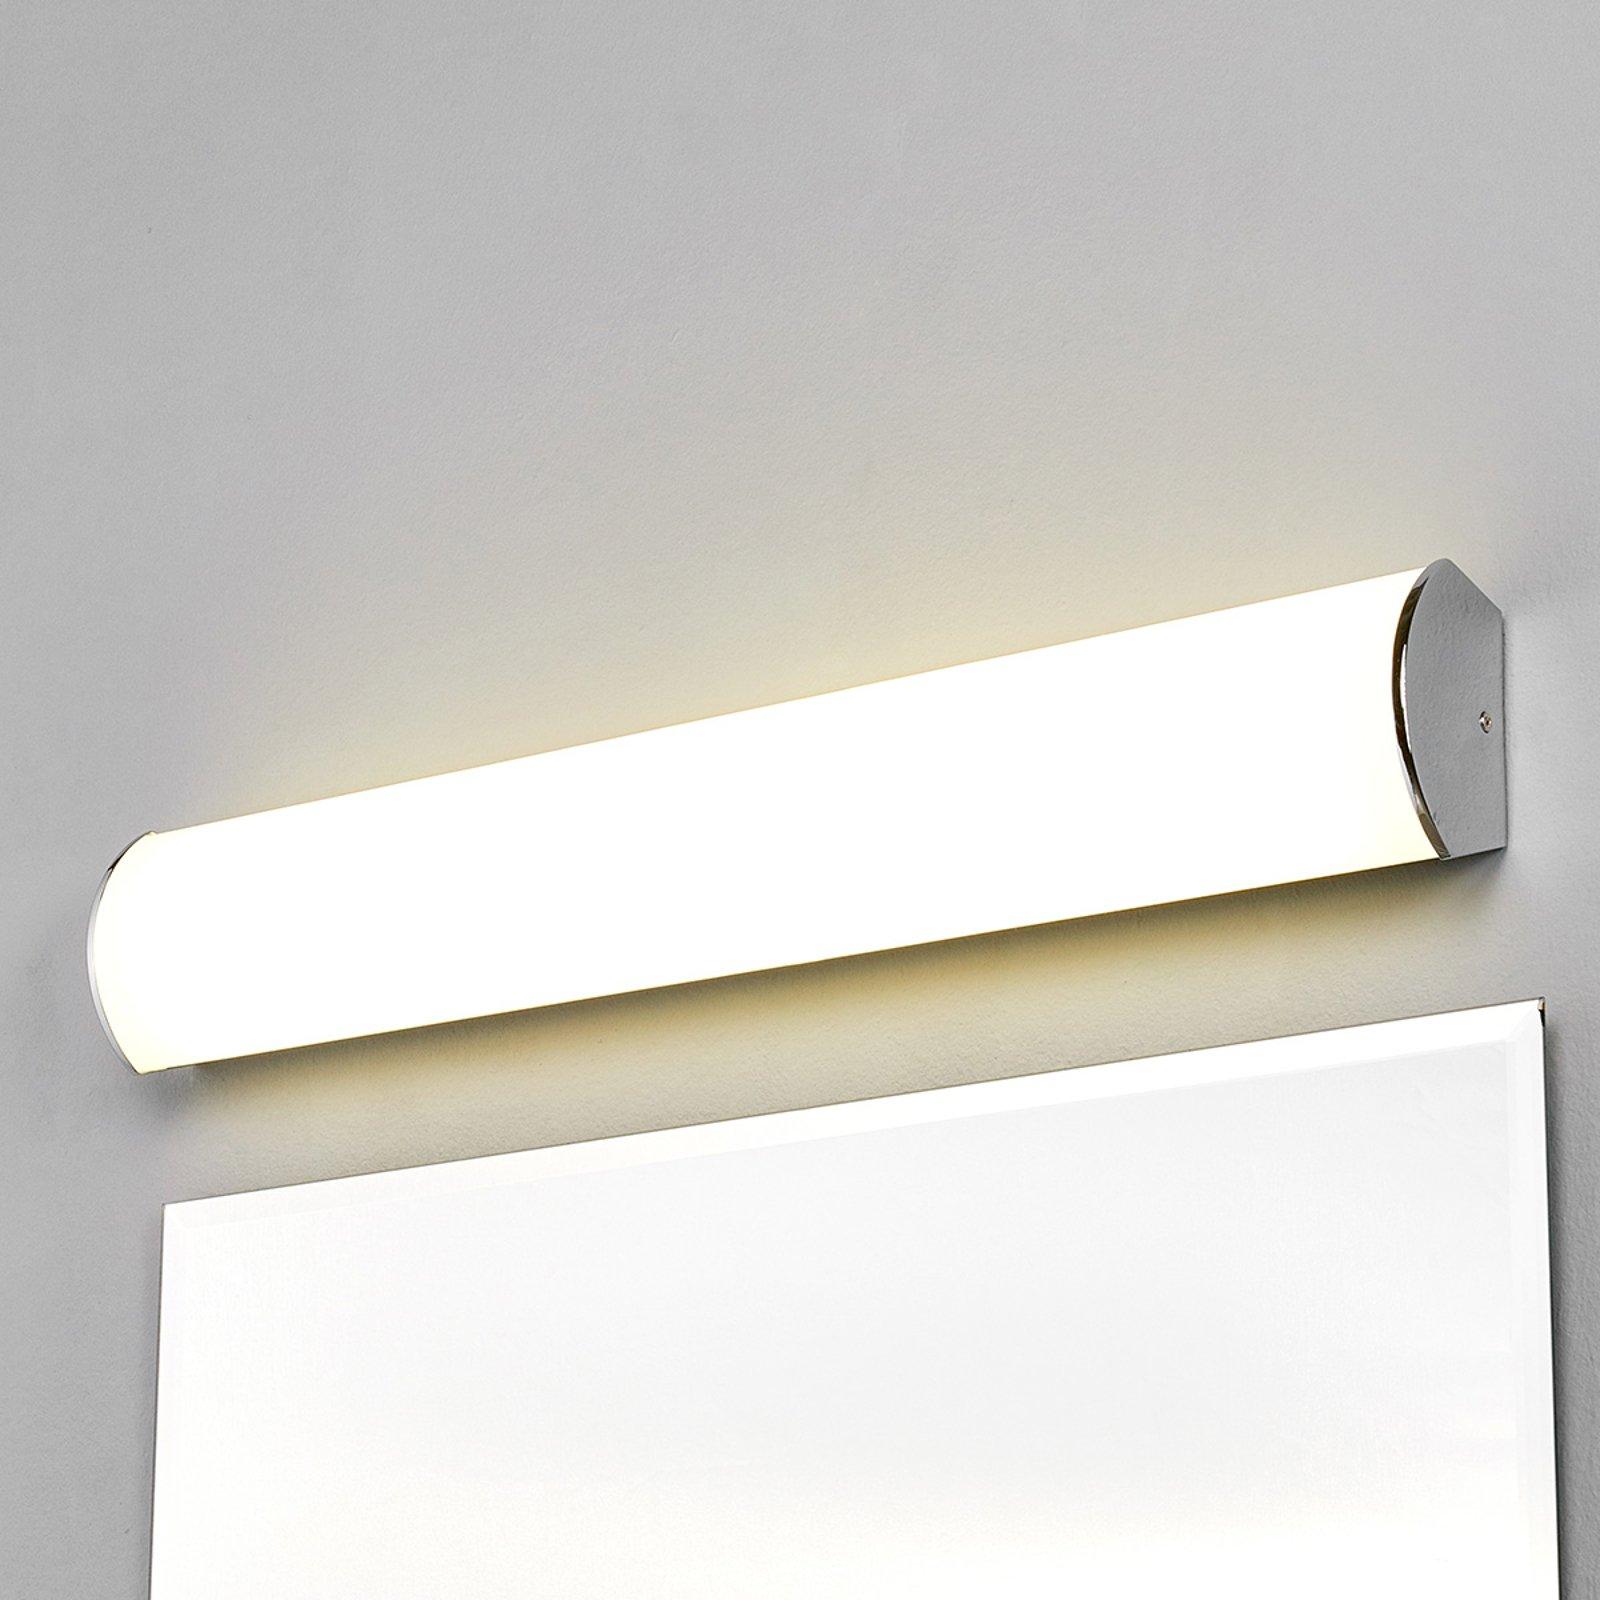 LED-vegglampe Elanur til badet